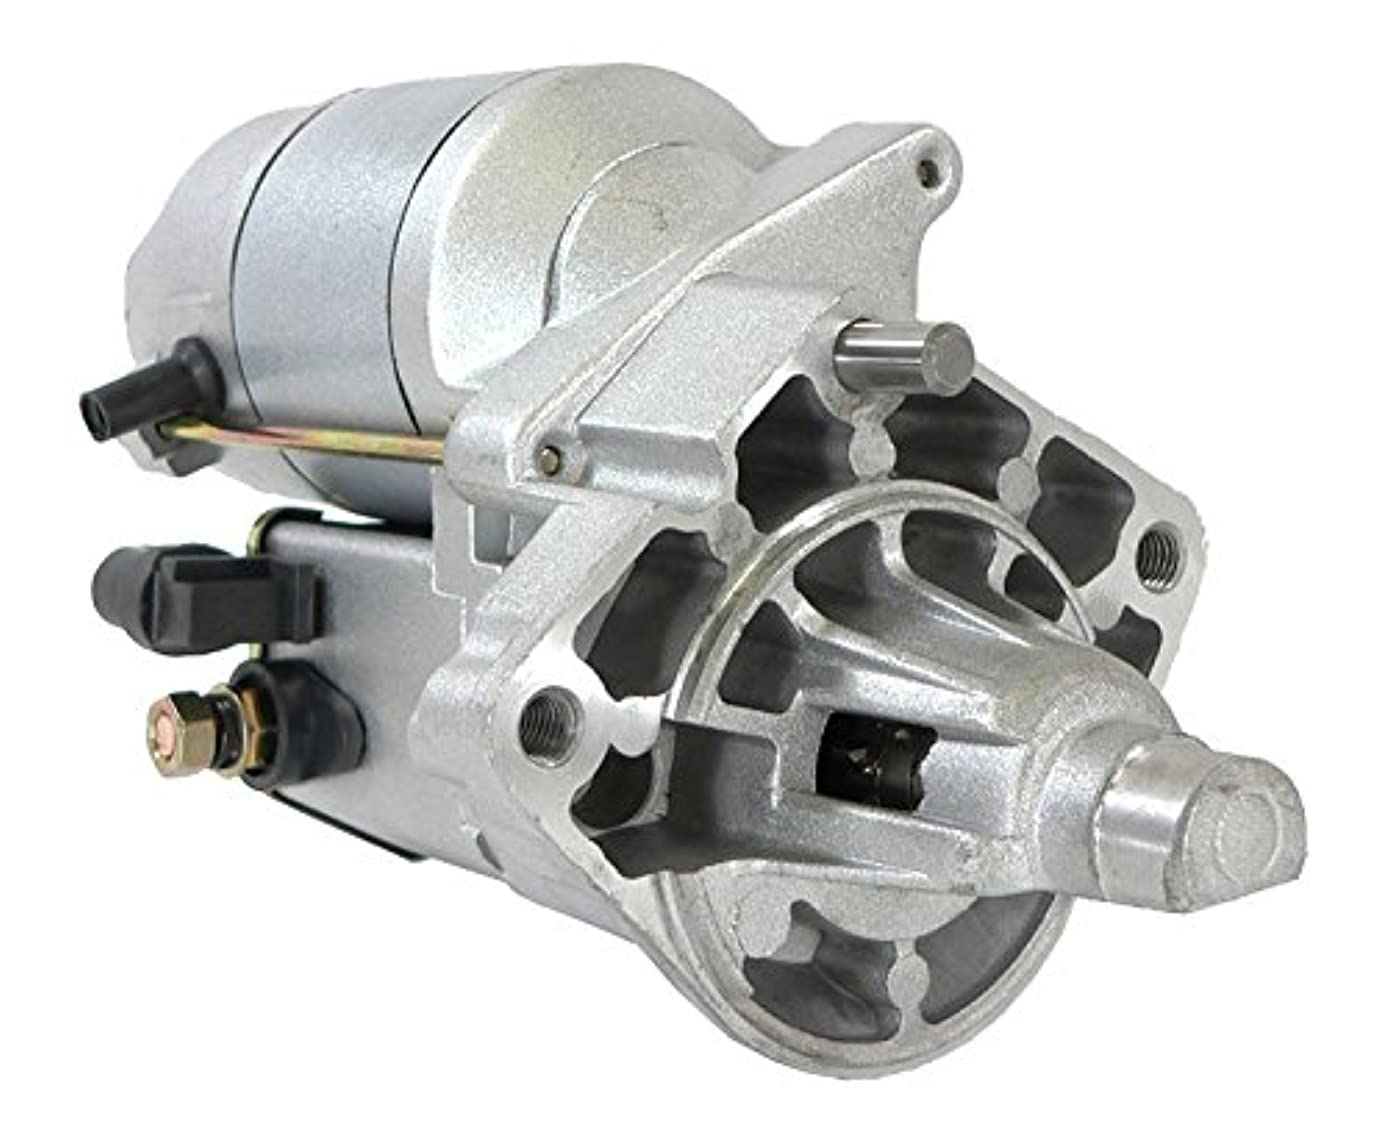 DB Electrical SND0270 Starter For Chrysler 3.3 3.3L 3.8 3.8L Town & Country 99 00 01 02 03 04/ Dodge 3.3L 3.8L Caravan 99-04/ Plymouth 3.3L 3.8L Voyager 99 00/4686045AB, 228000-7640, 228000-7641